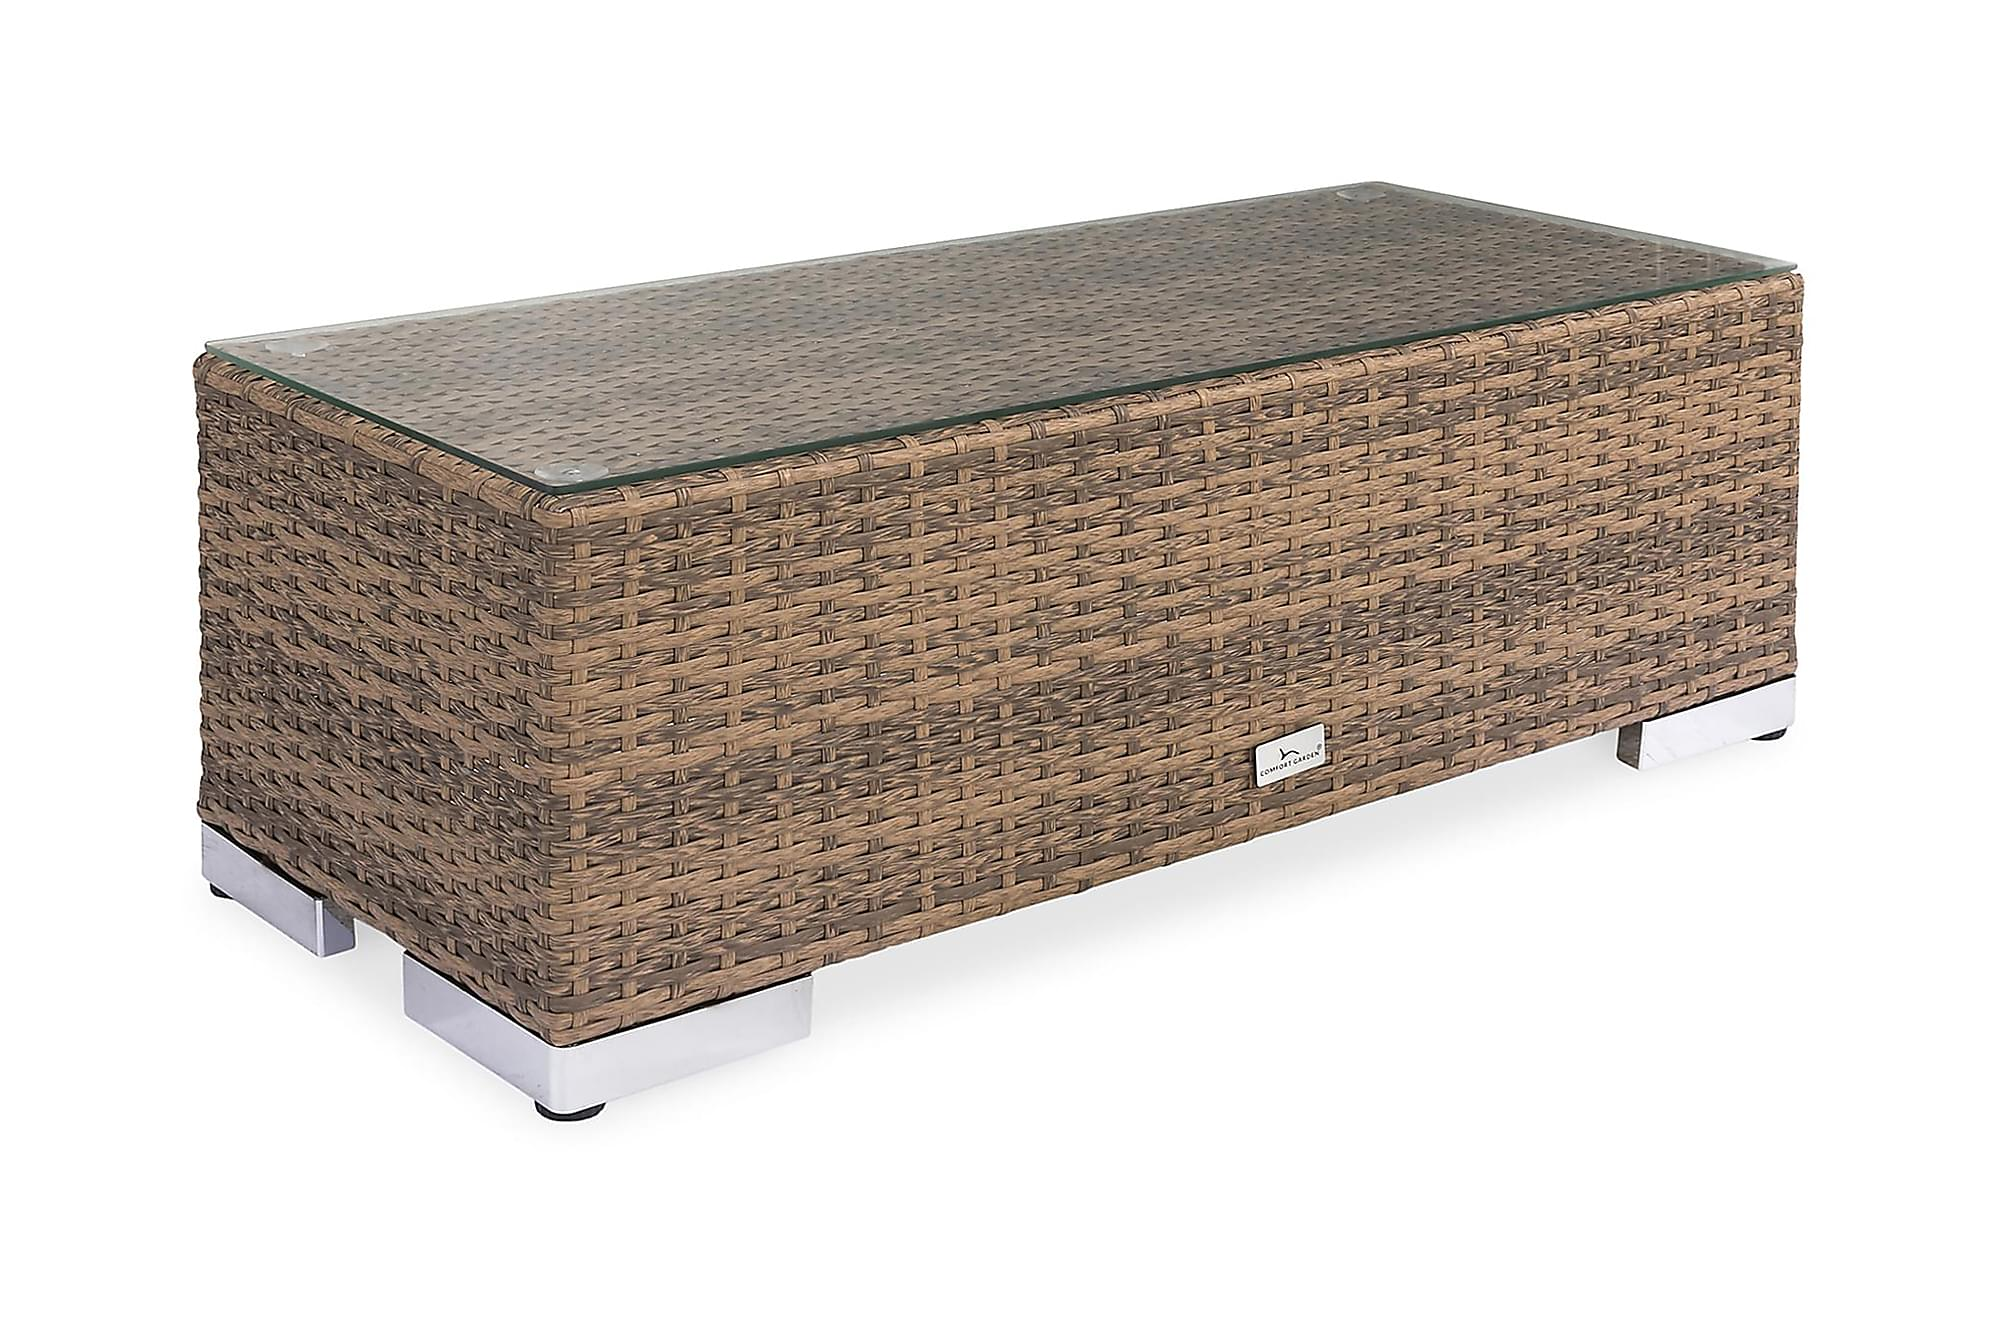 BAHAMAS Avslut 38x90 cm Sand, Loungemöbler